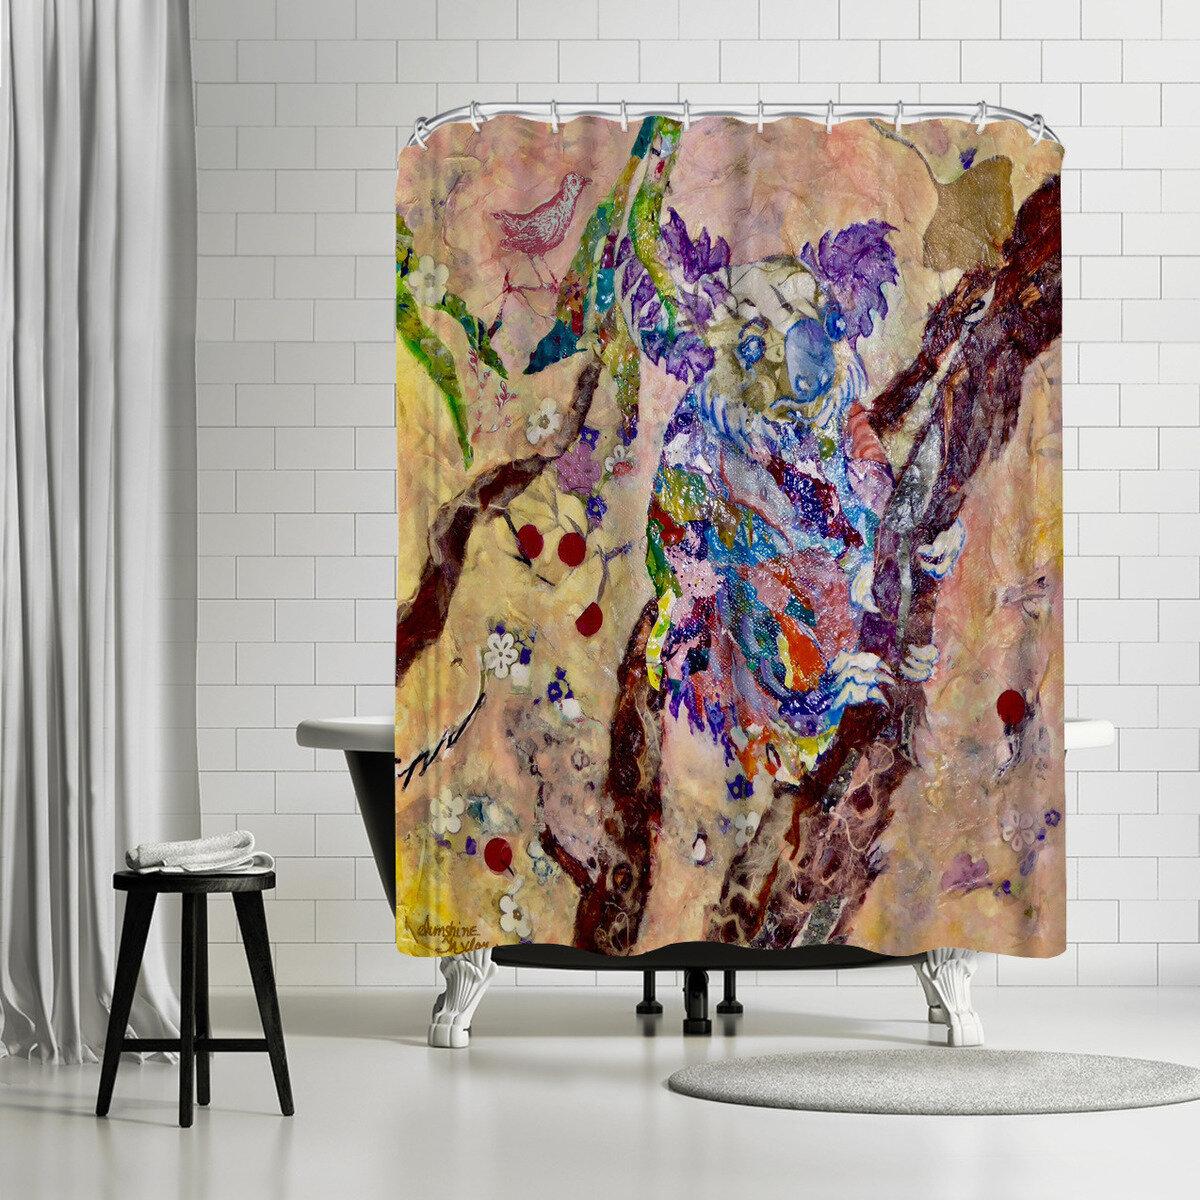 72x72/'/' Australia Koala bear Shower Curtain Waterproof Fabric Bathroom 12 Hooks